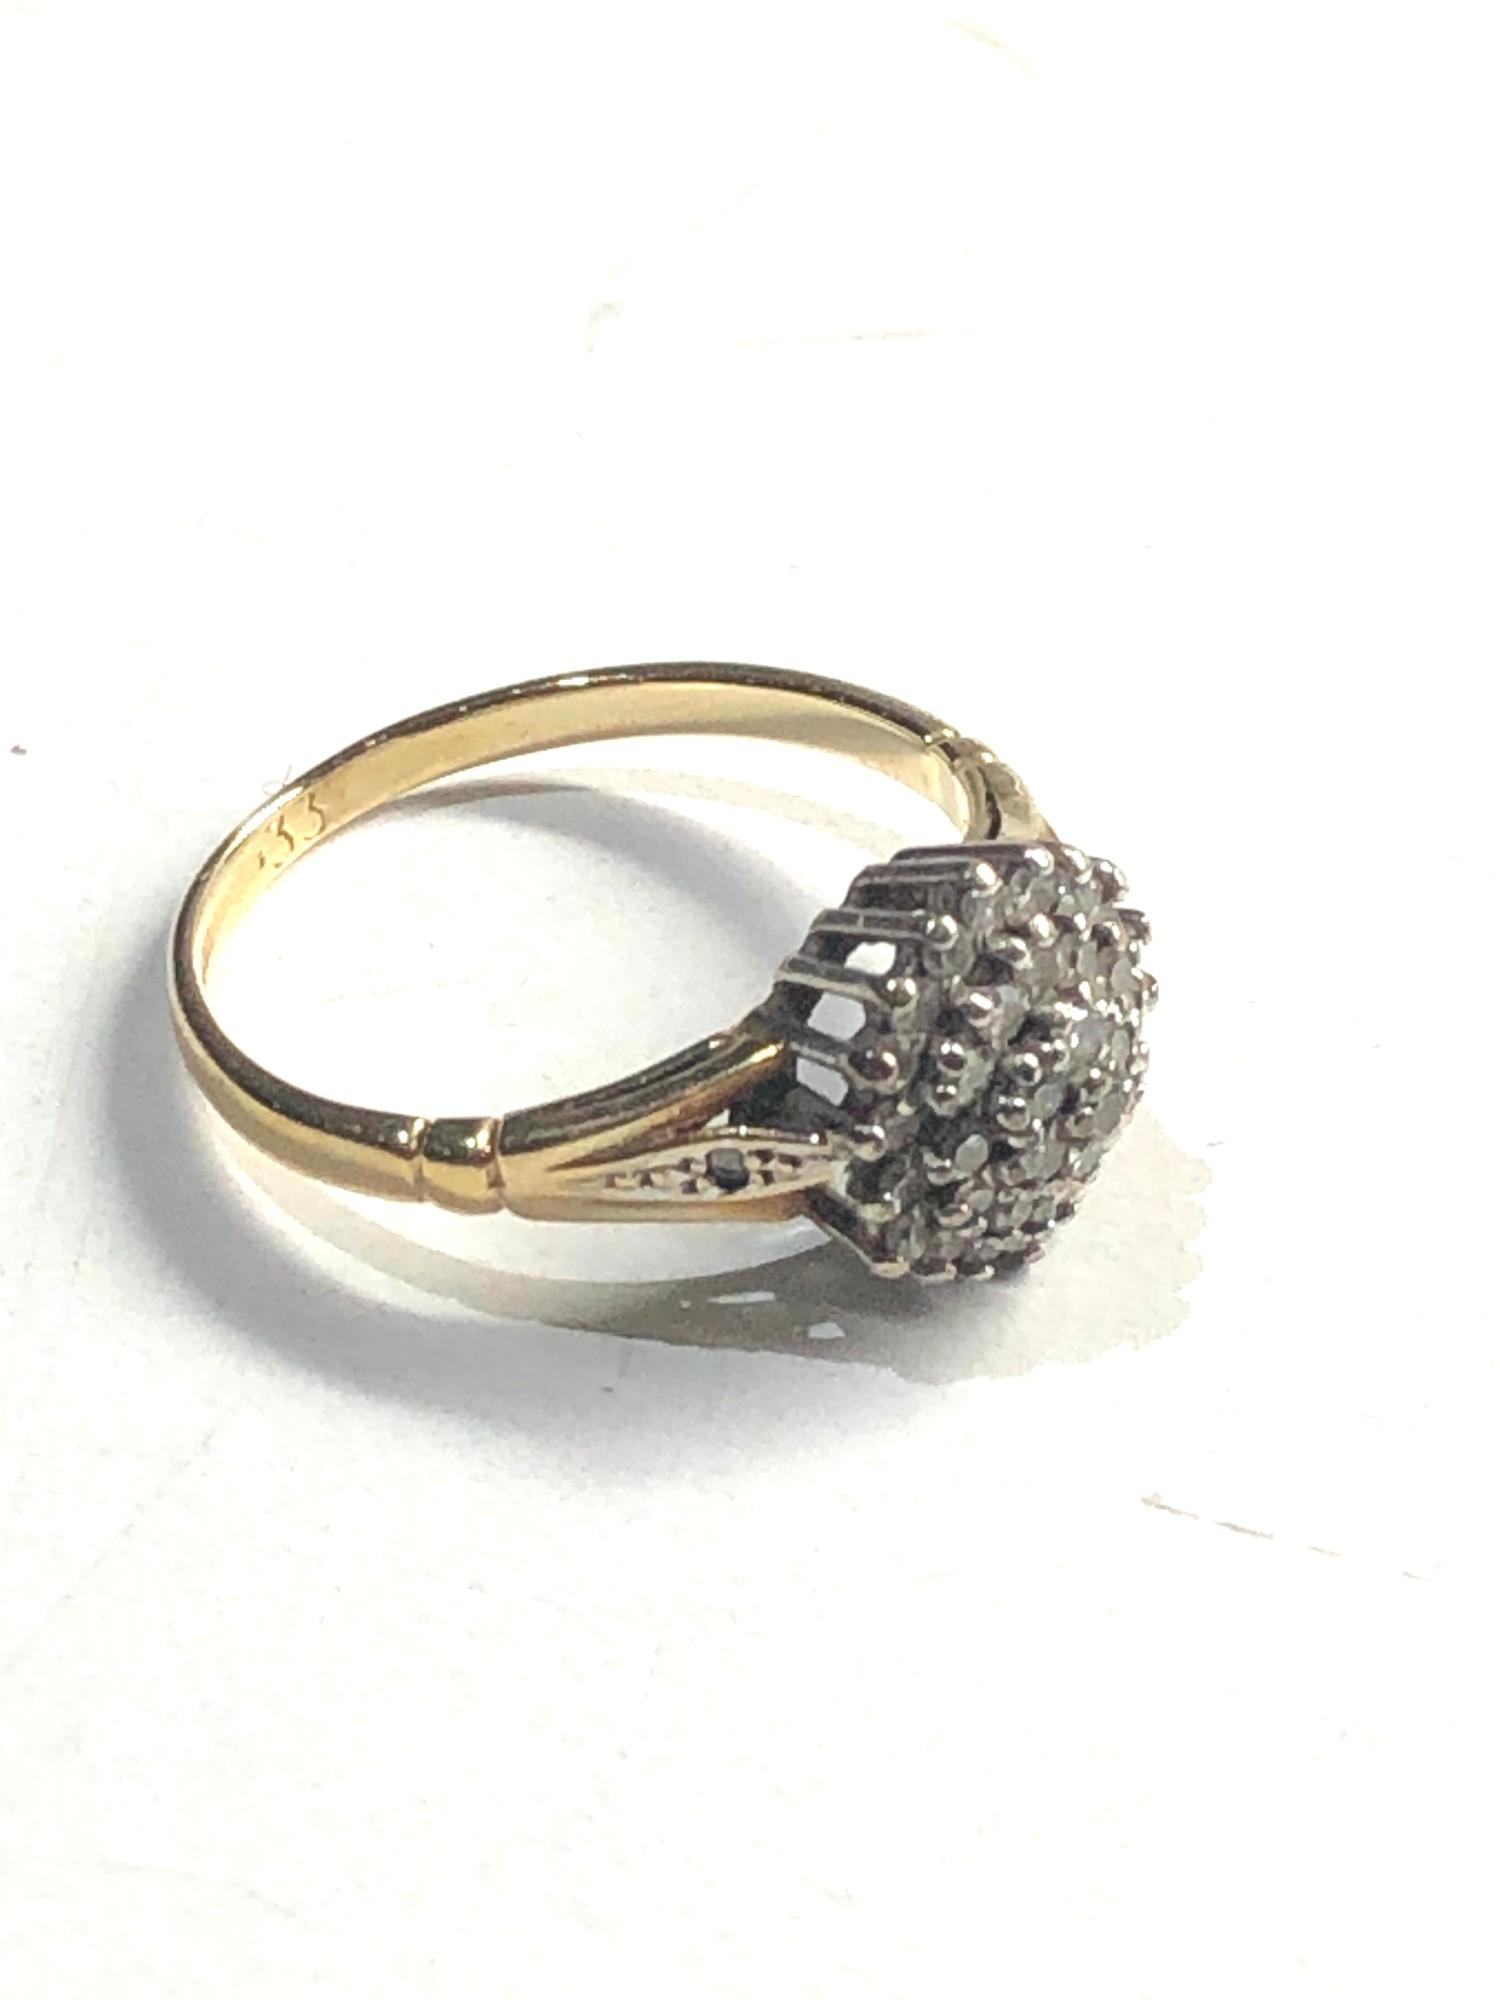 9ct gold diamond cluster ring 0.33ct diamonds - Image 2 of 3